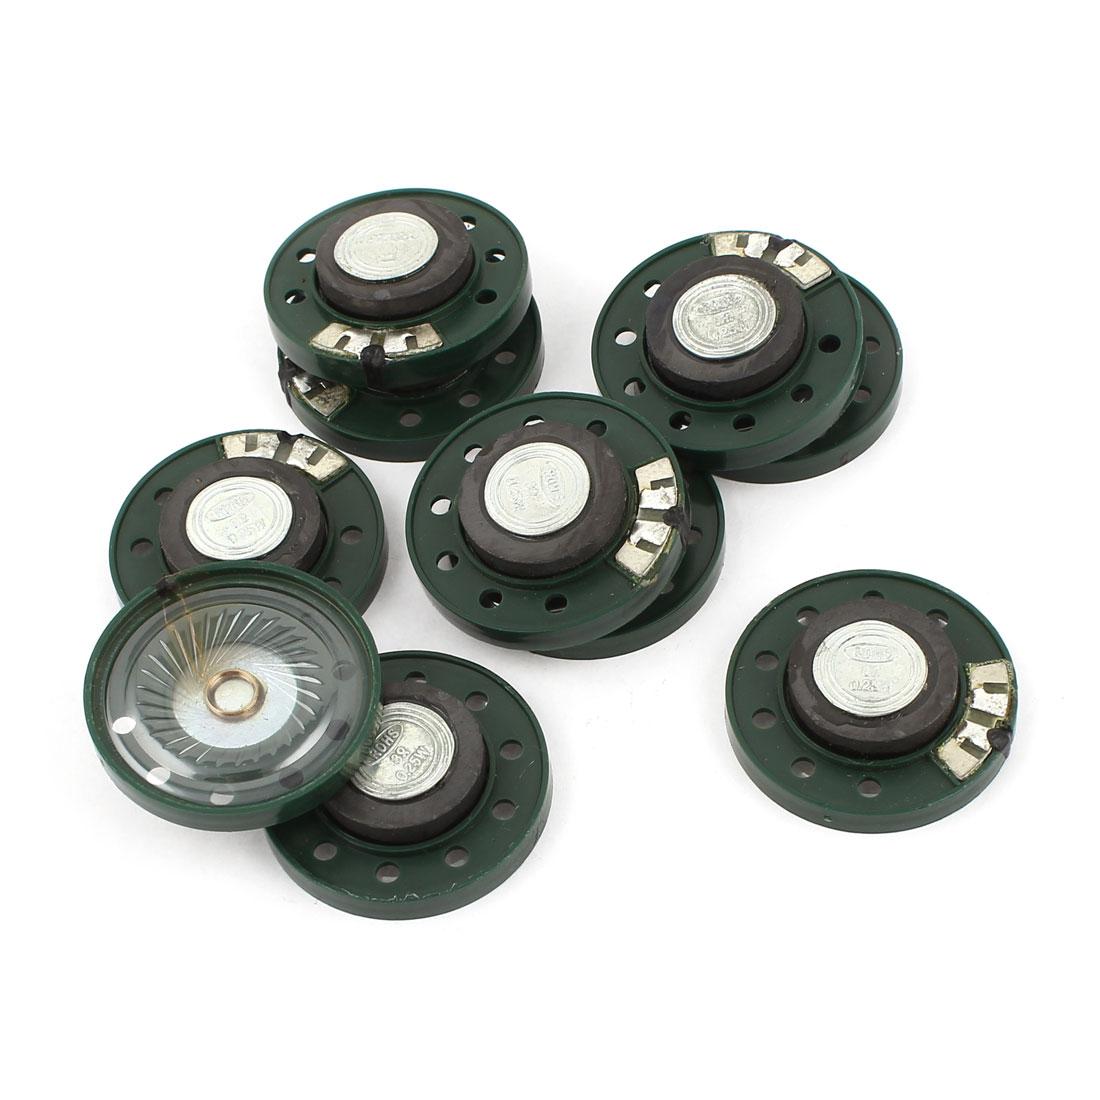 10 Pcs 0.25W 8Ohm 35mm Round Plastic Shell Magnet Electronic Speaker Loudspeaker